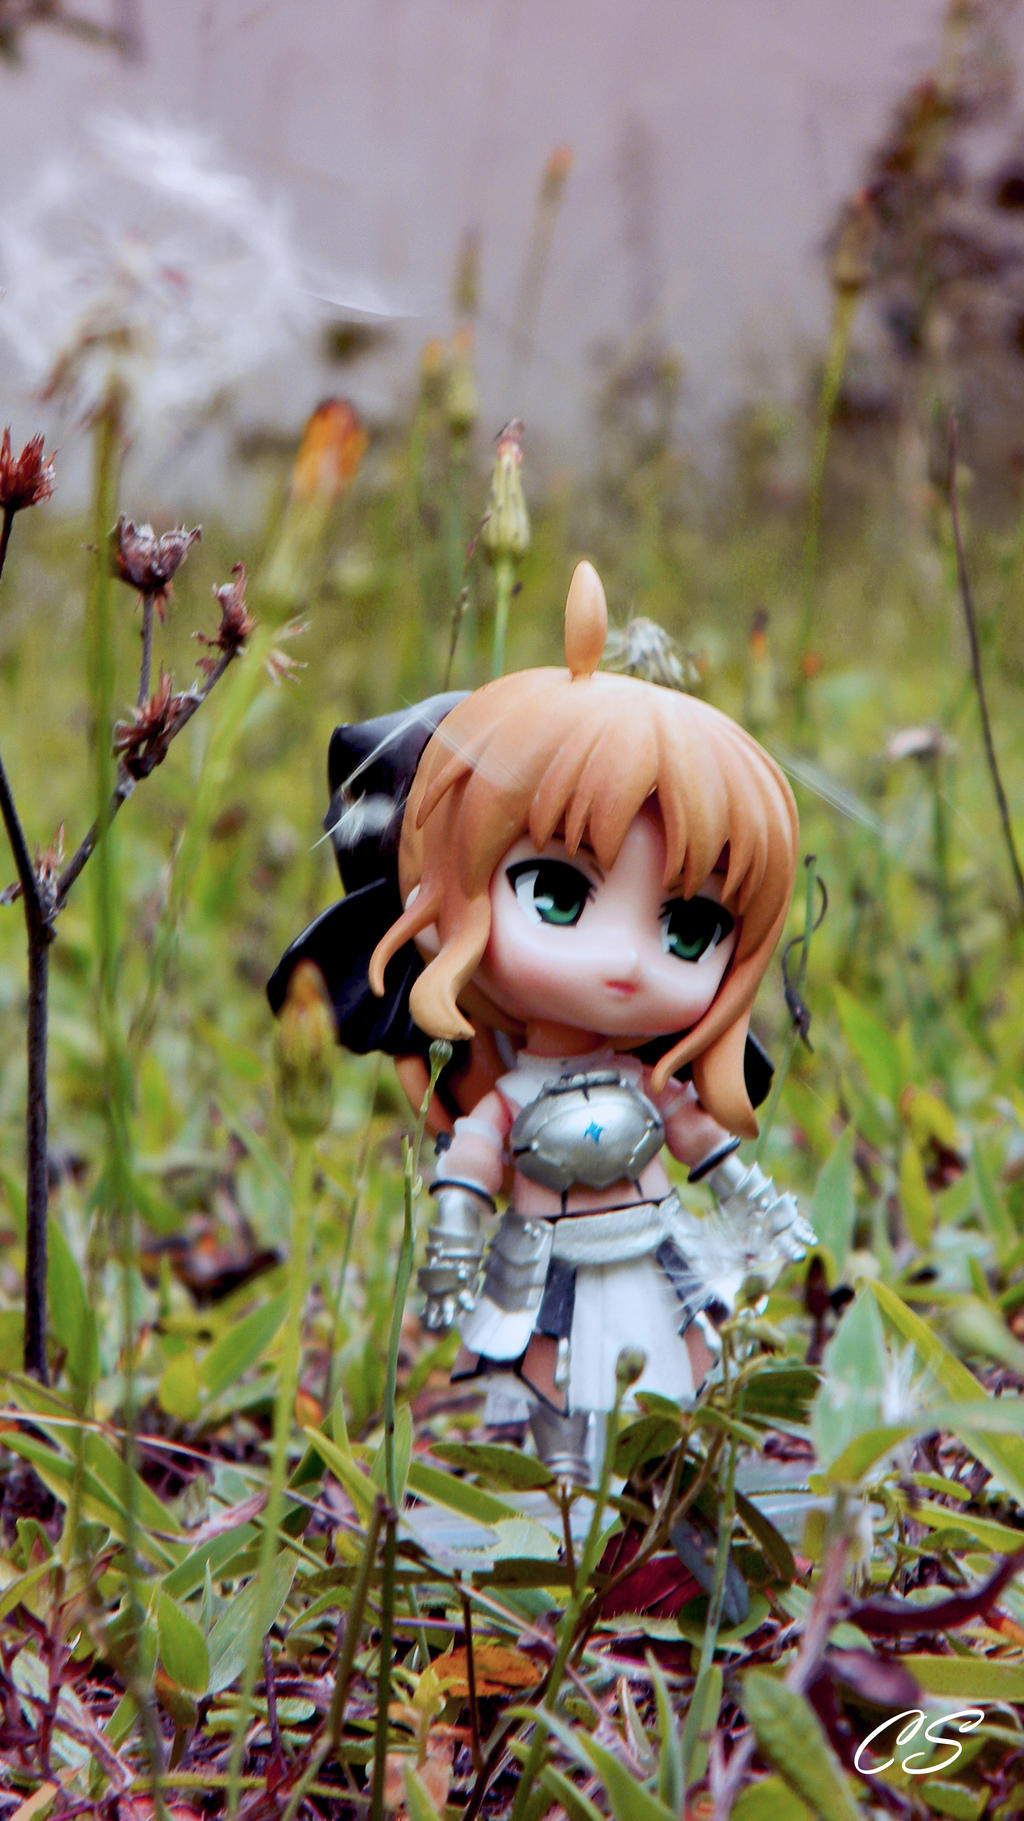 Saber Lily by PrincessTeppelin